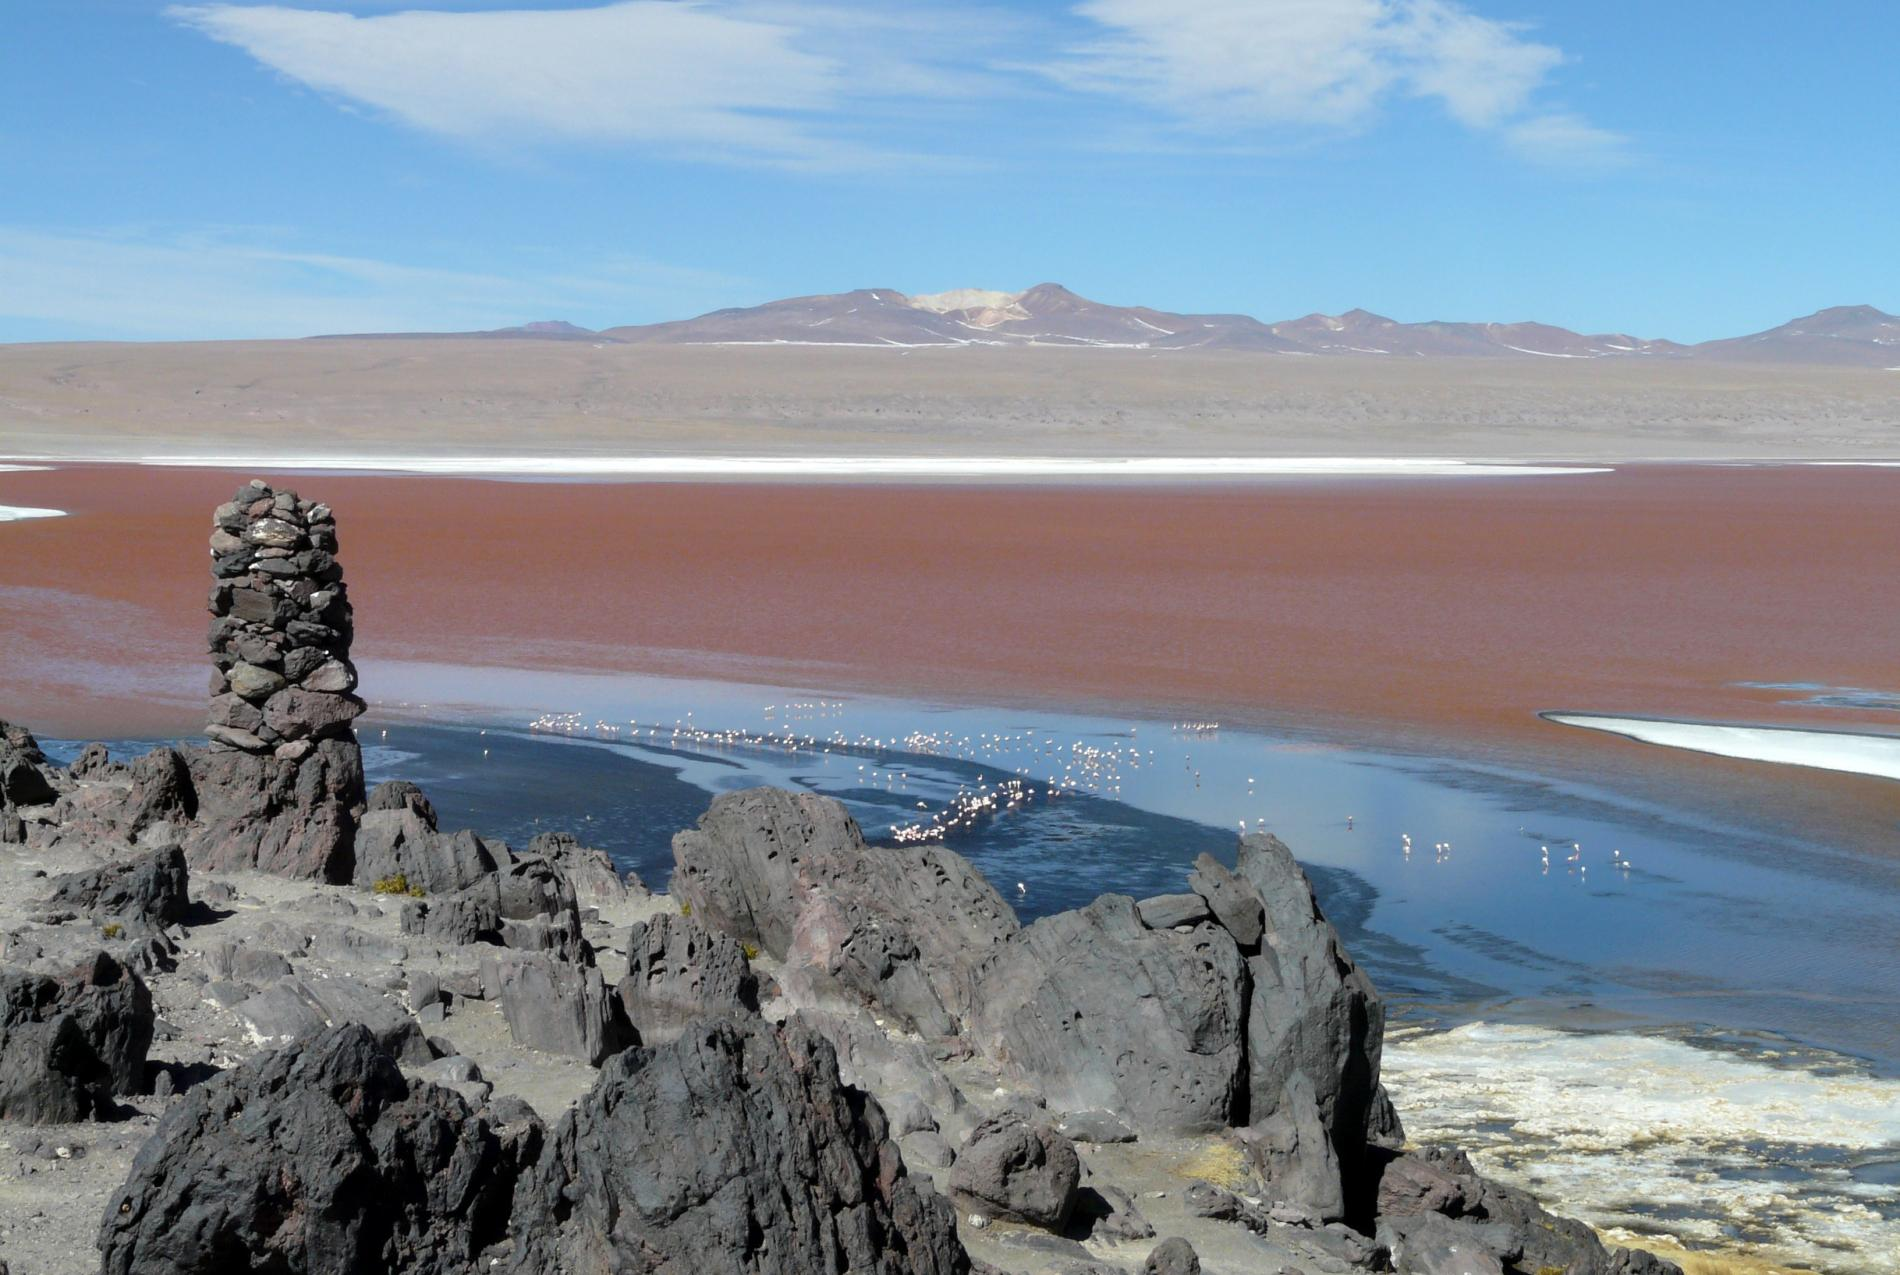 Voyage solidaire Bolivie : Vision du Monde - Photo 9